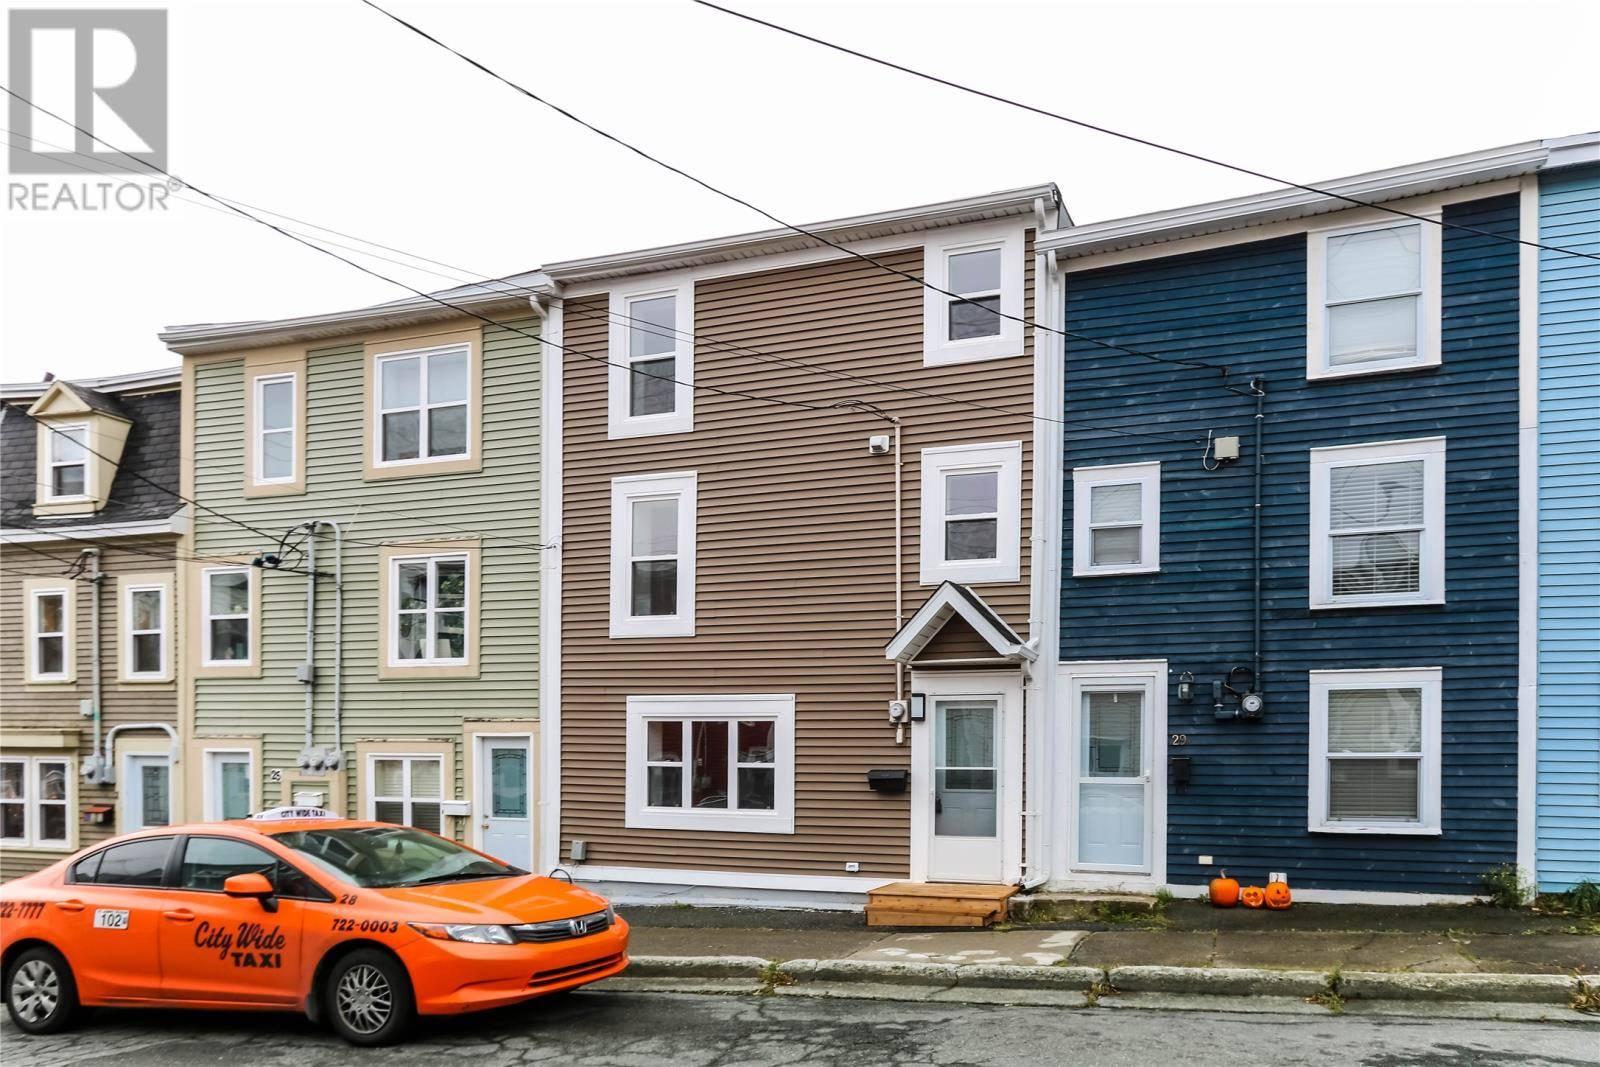 House for sale at 27 Mullock St St. John's Newfoundland - MLS: 1206729